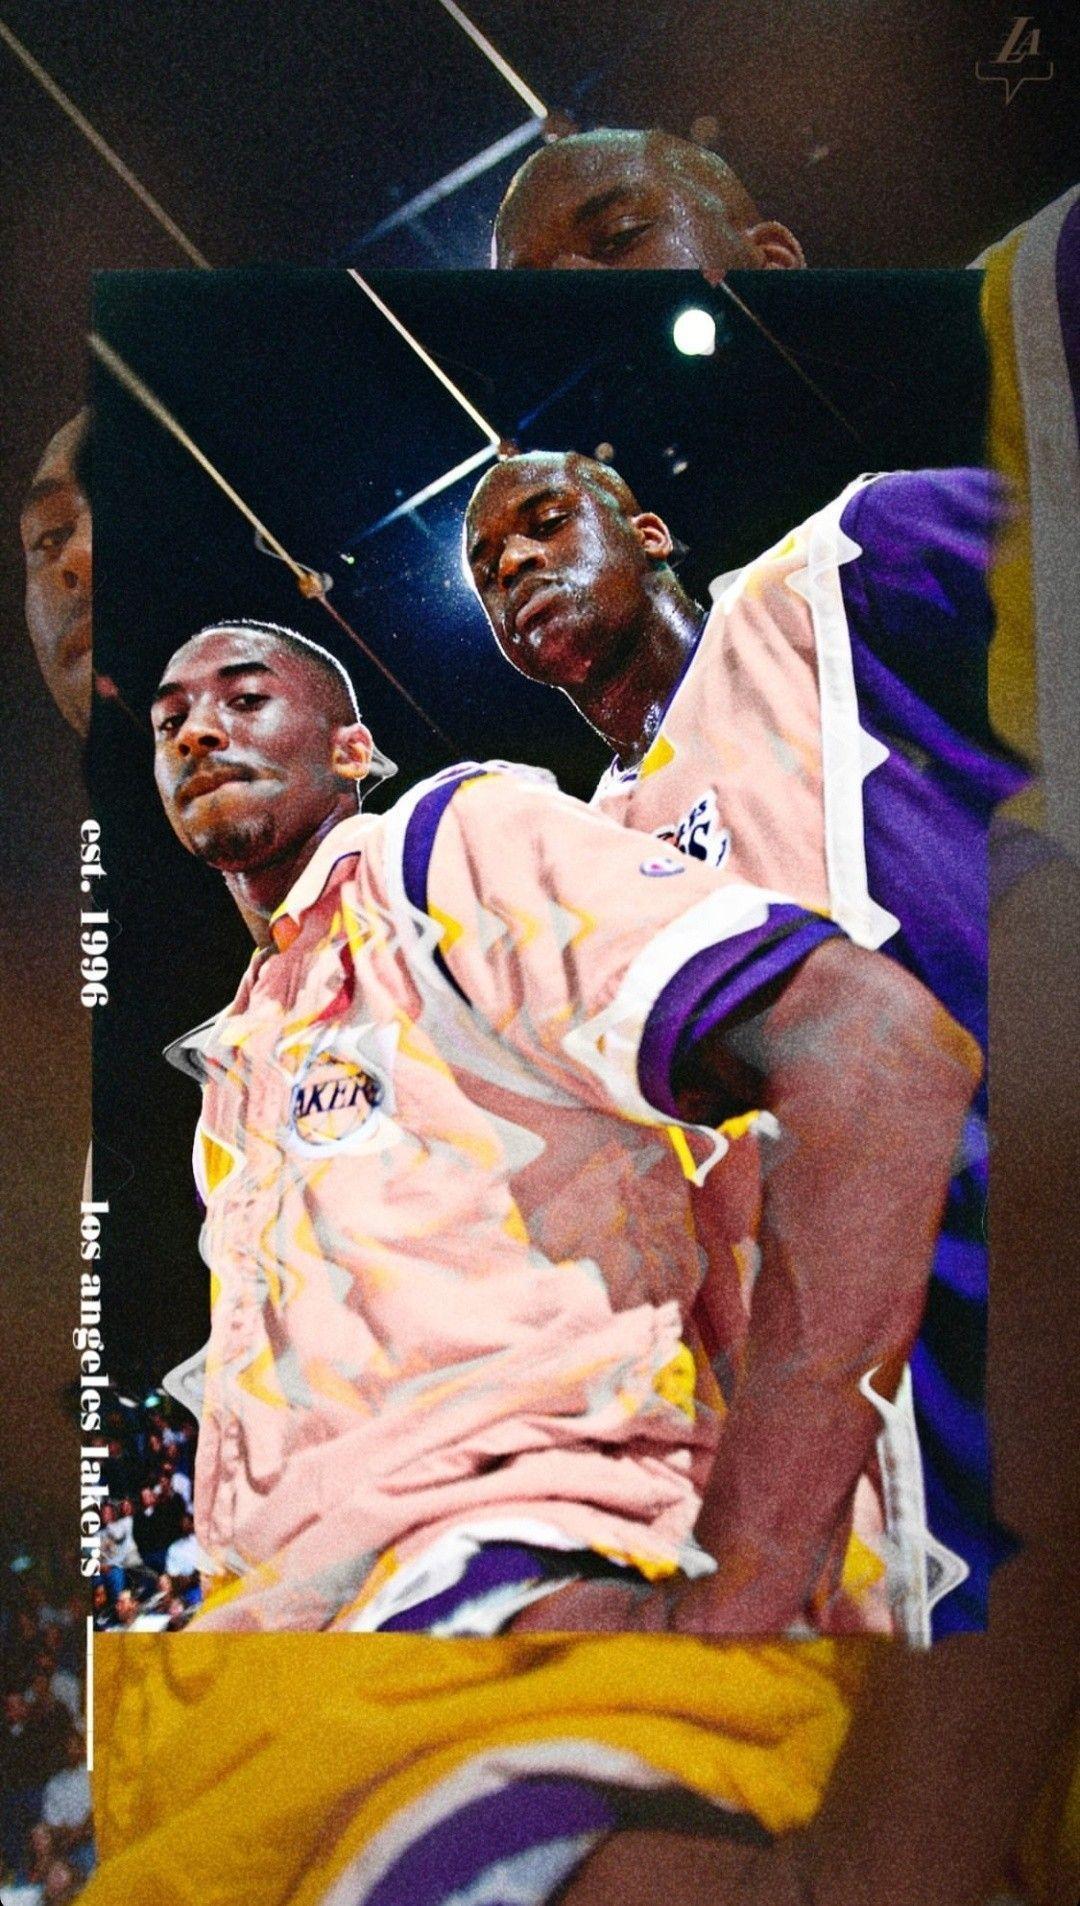 Kobe Bryant Championship Jacket Wallpaper : bryant, championship, jacket, wallpaper, Wallpapers, Backgrounds, WallpaperAccess